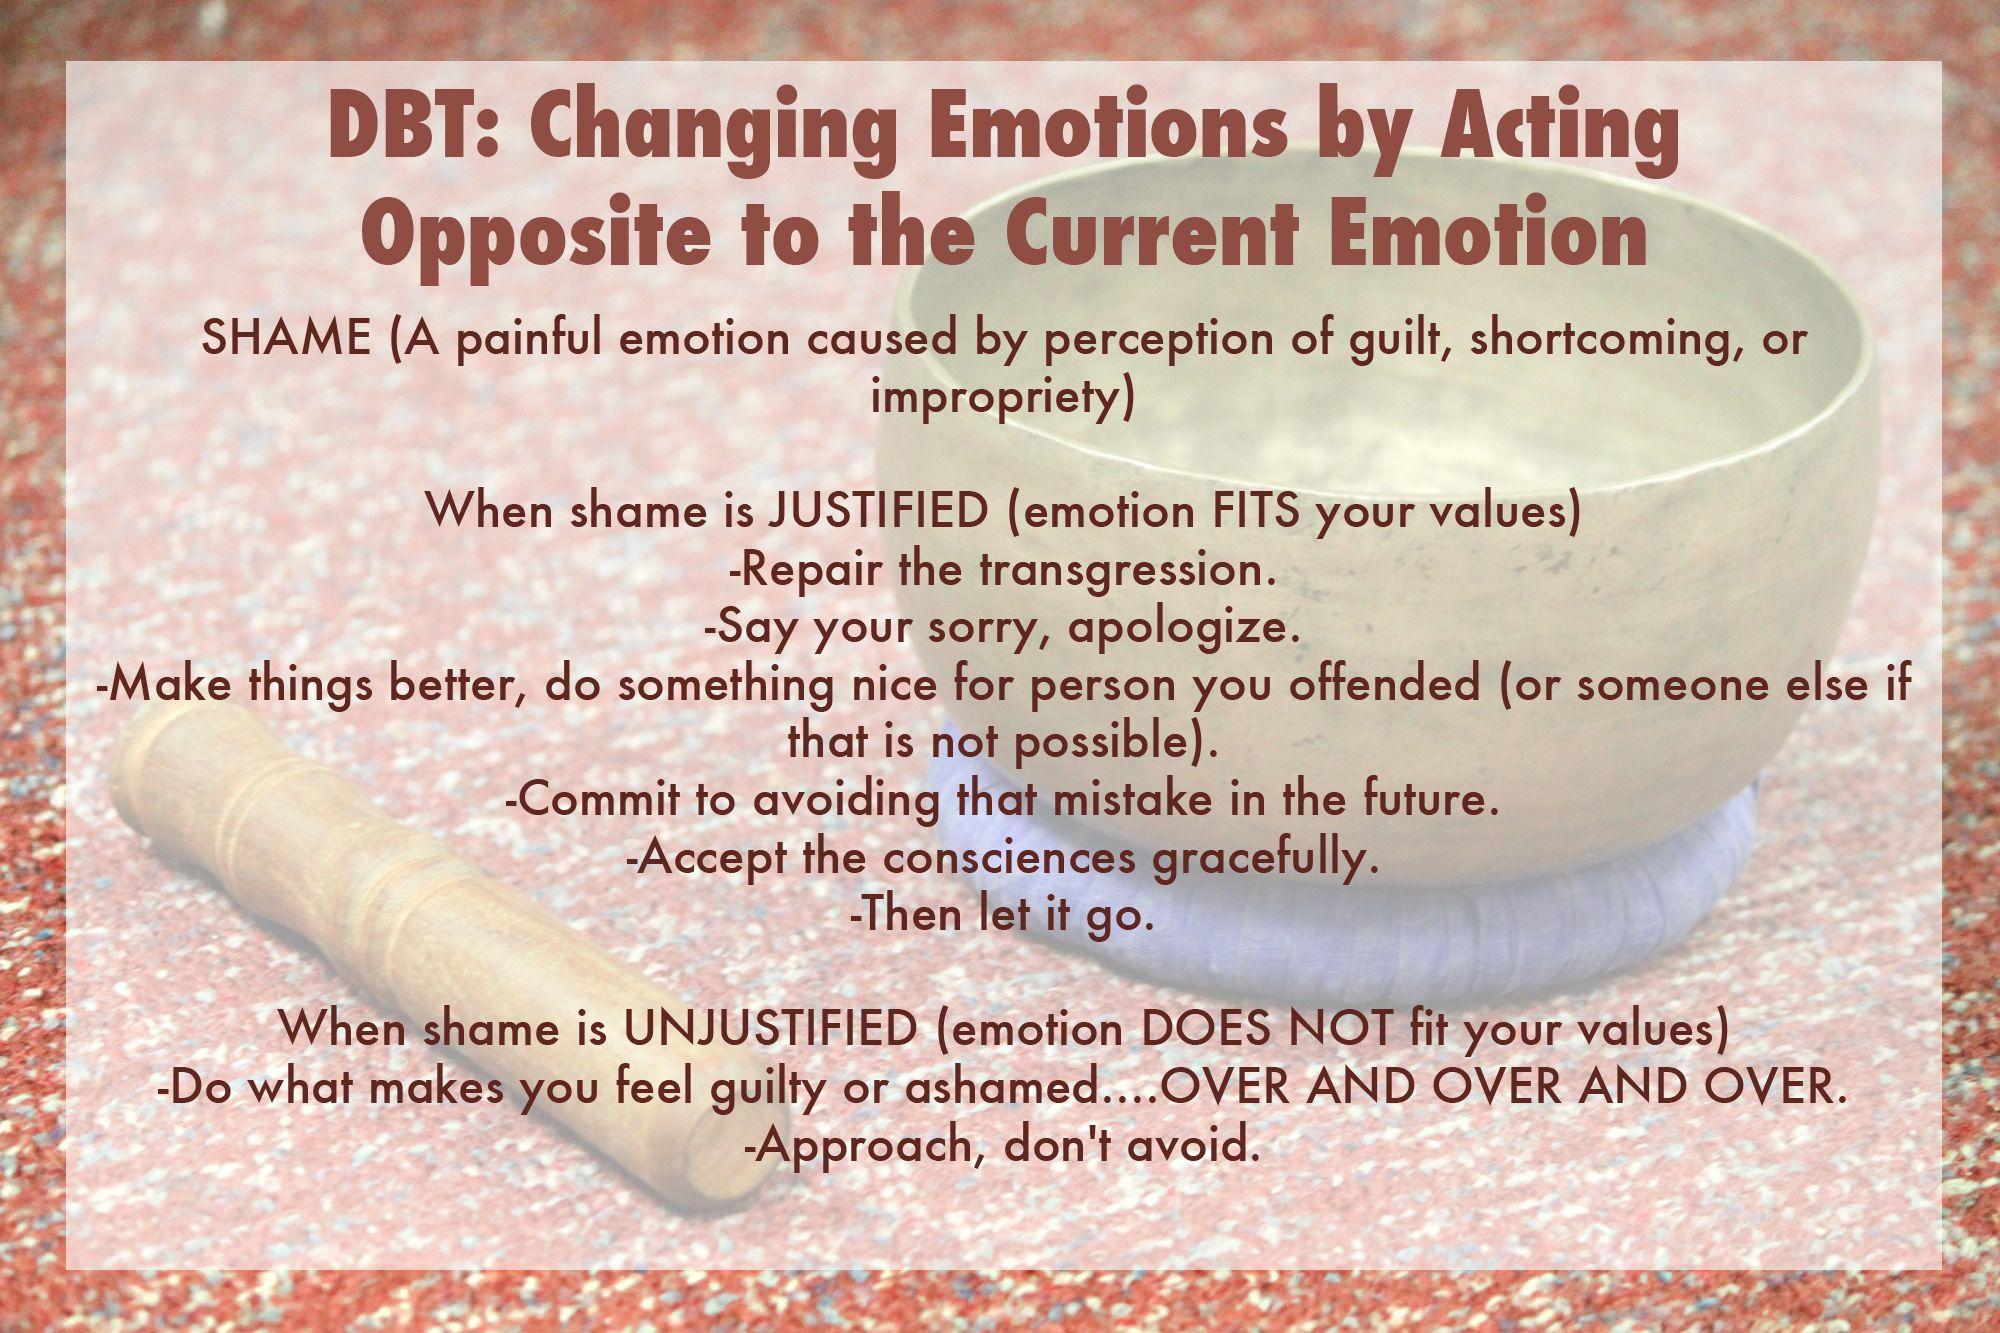 Dbt Emotionregulation Opposite Emotion